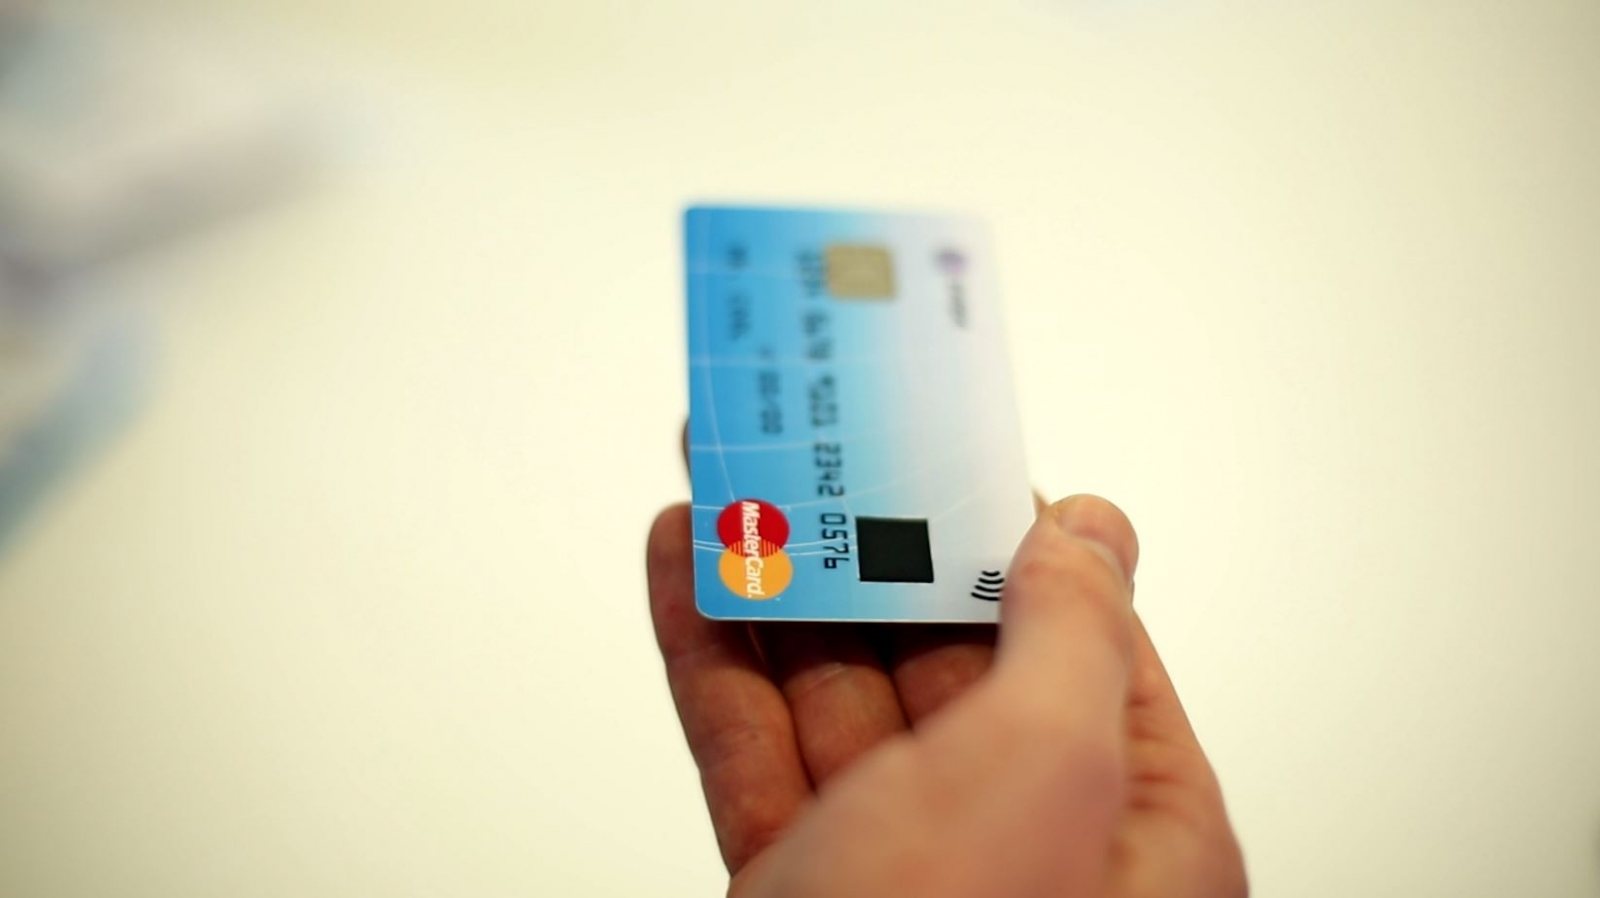 Zwipe MasterCard biometrics